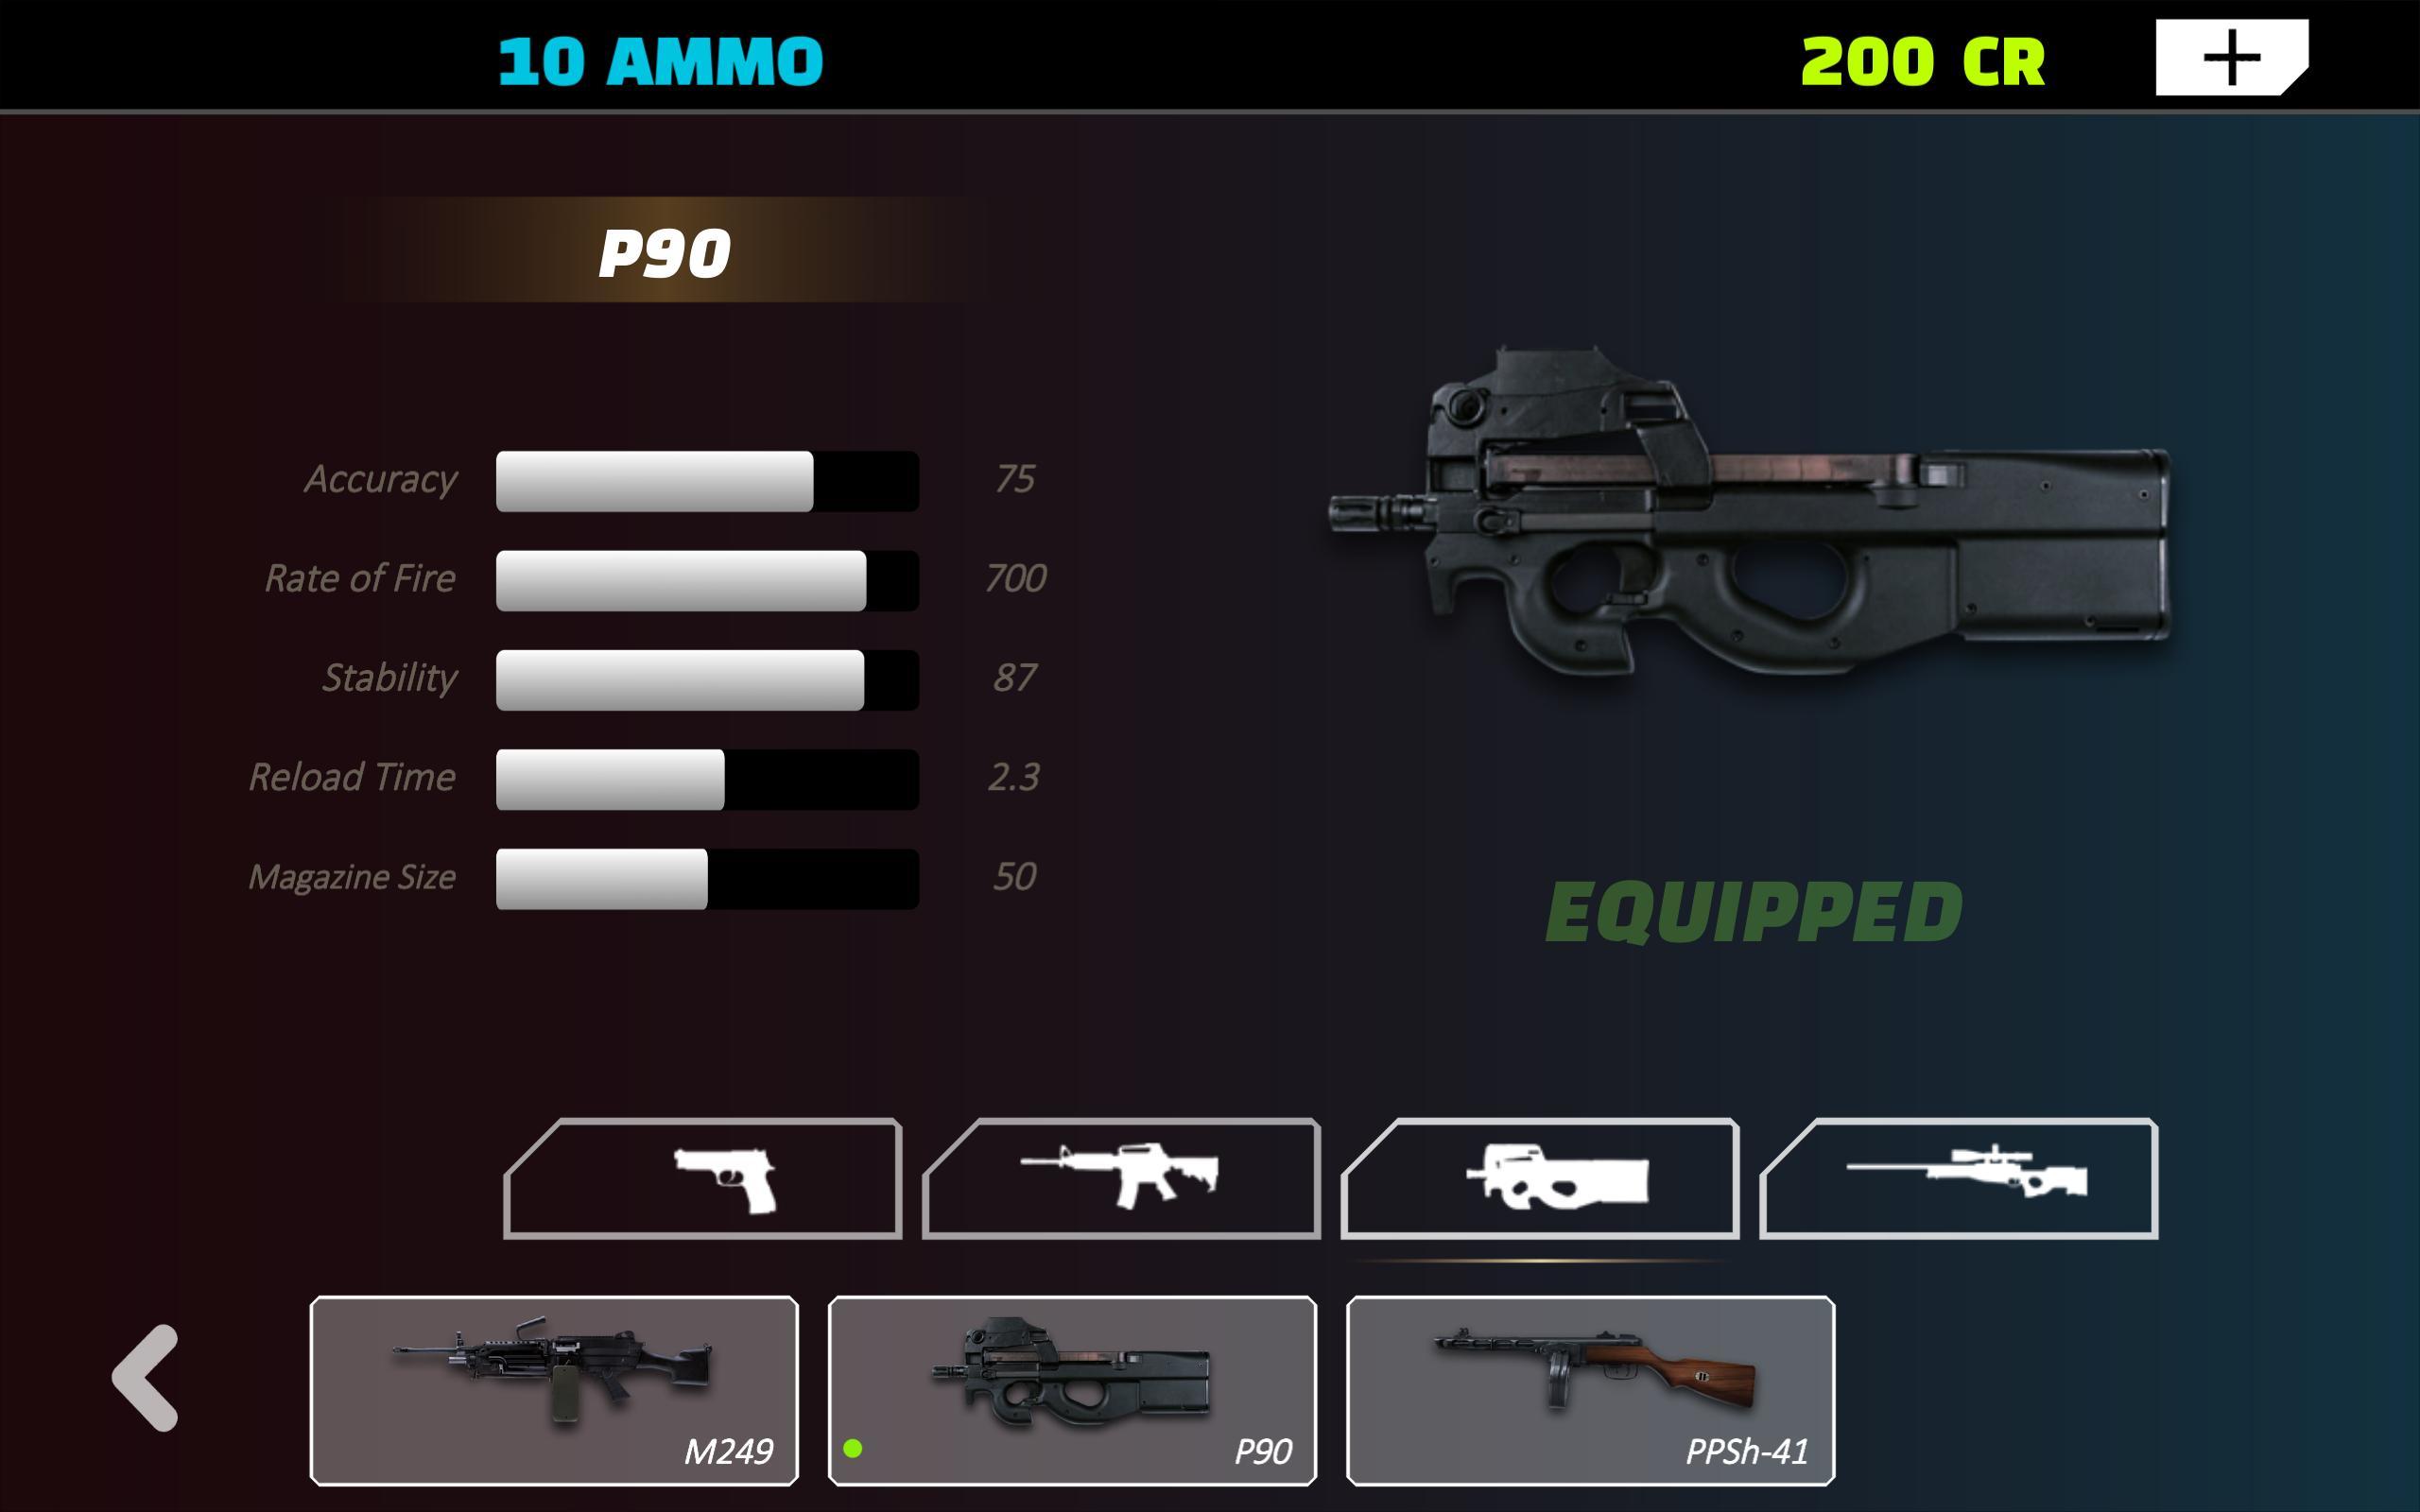 Canyon Shooting 2 - Free Shooting Range 3.0.6 Screenshot 11